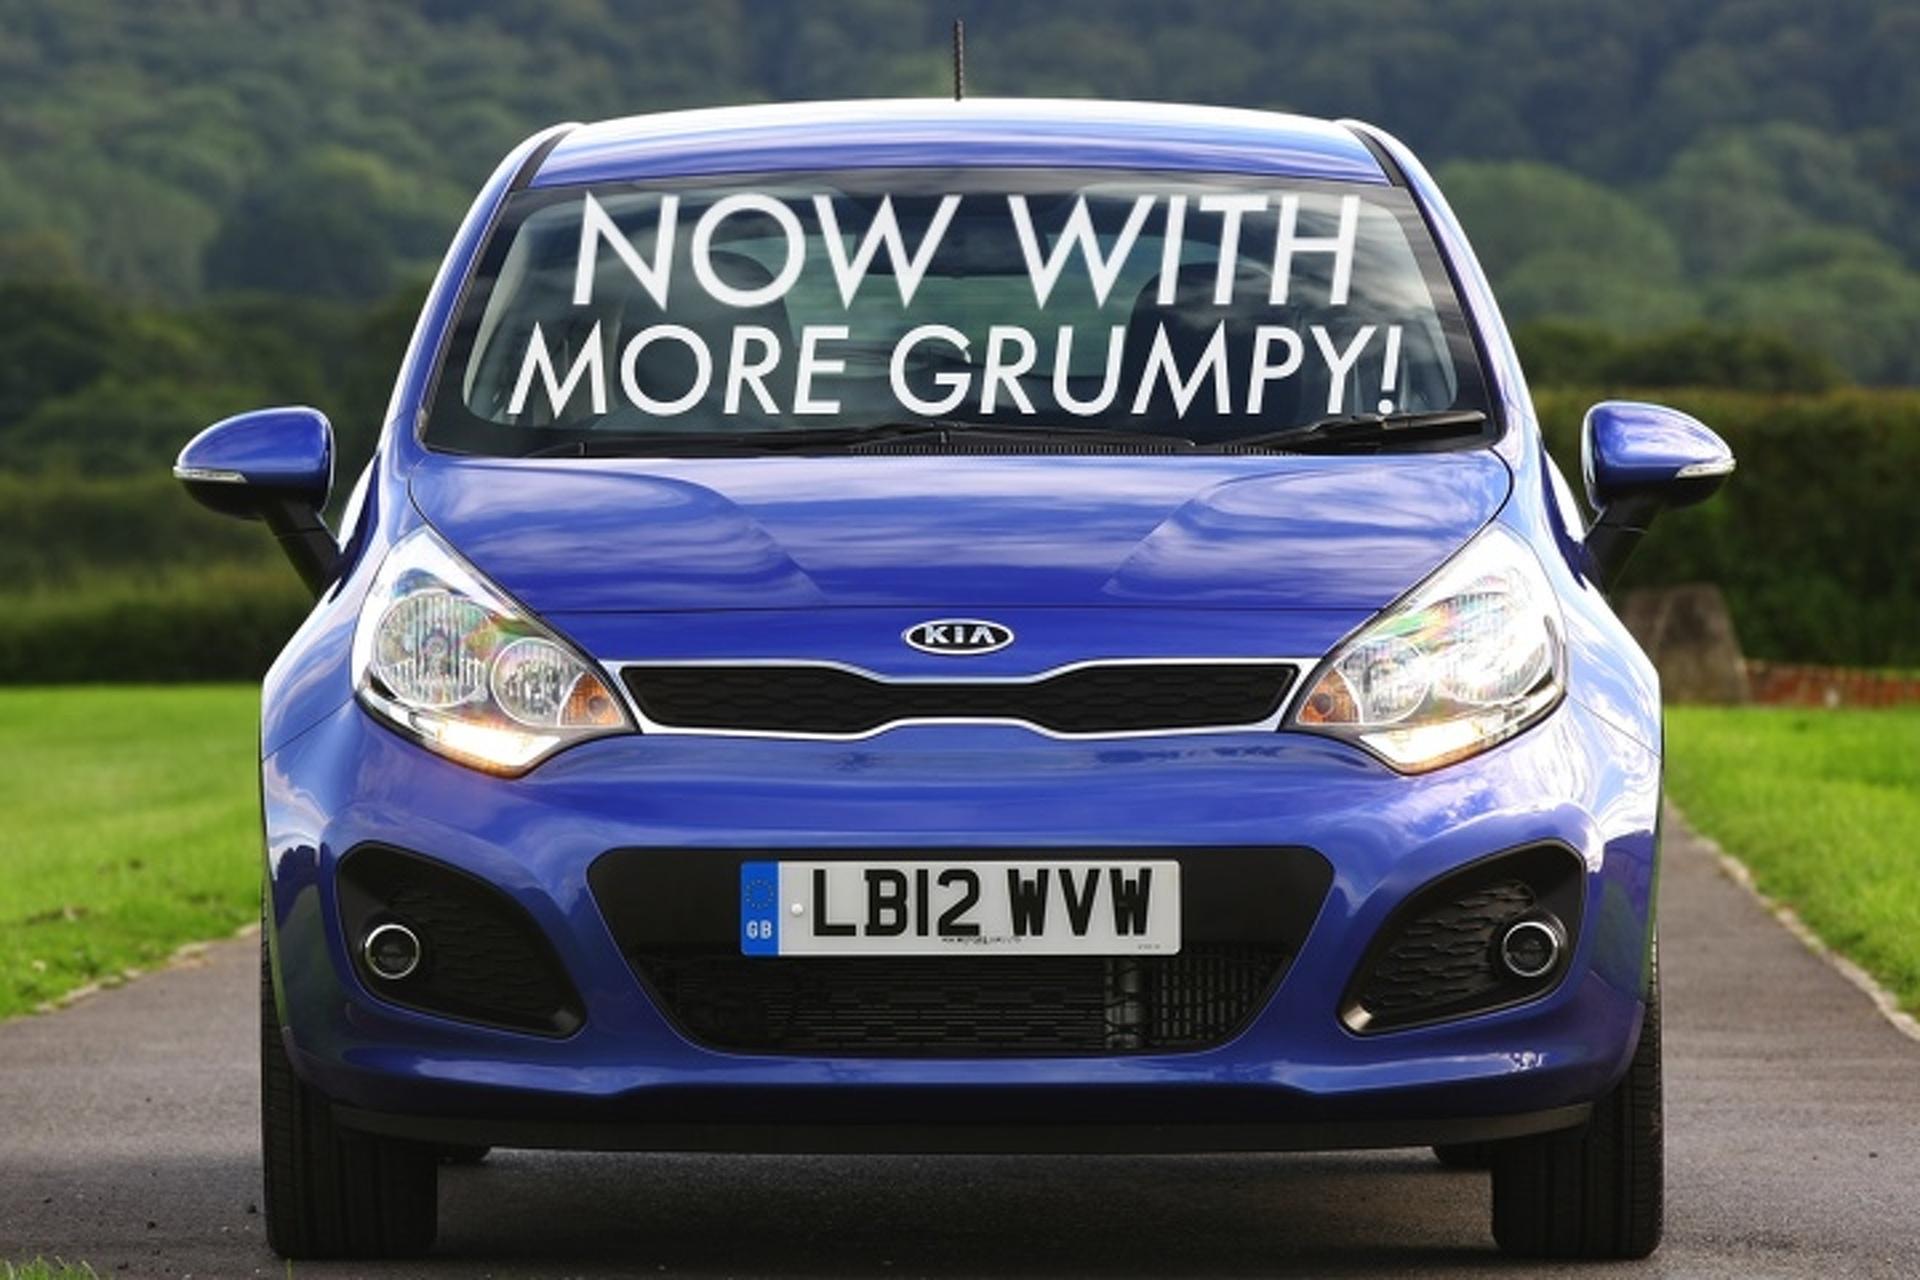 Build A Kia >> Kia Wants To Build A Hot Hatchback That Eats Ford Fiestas